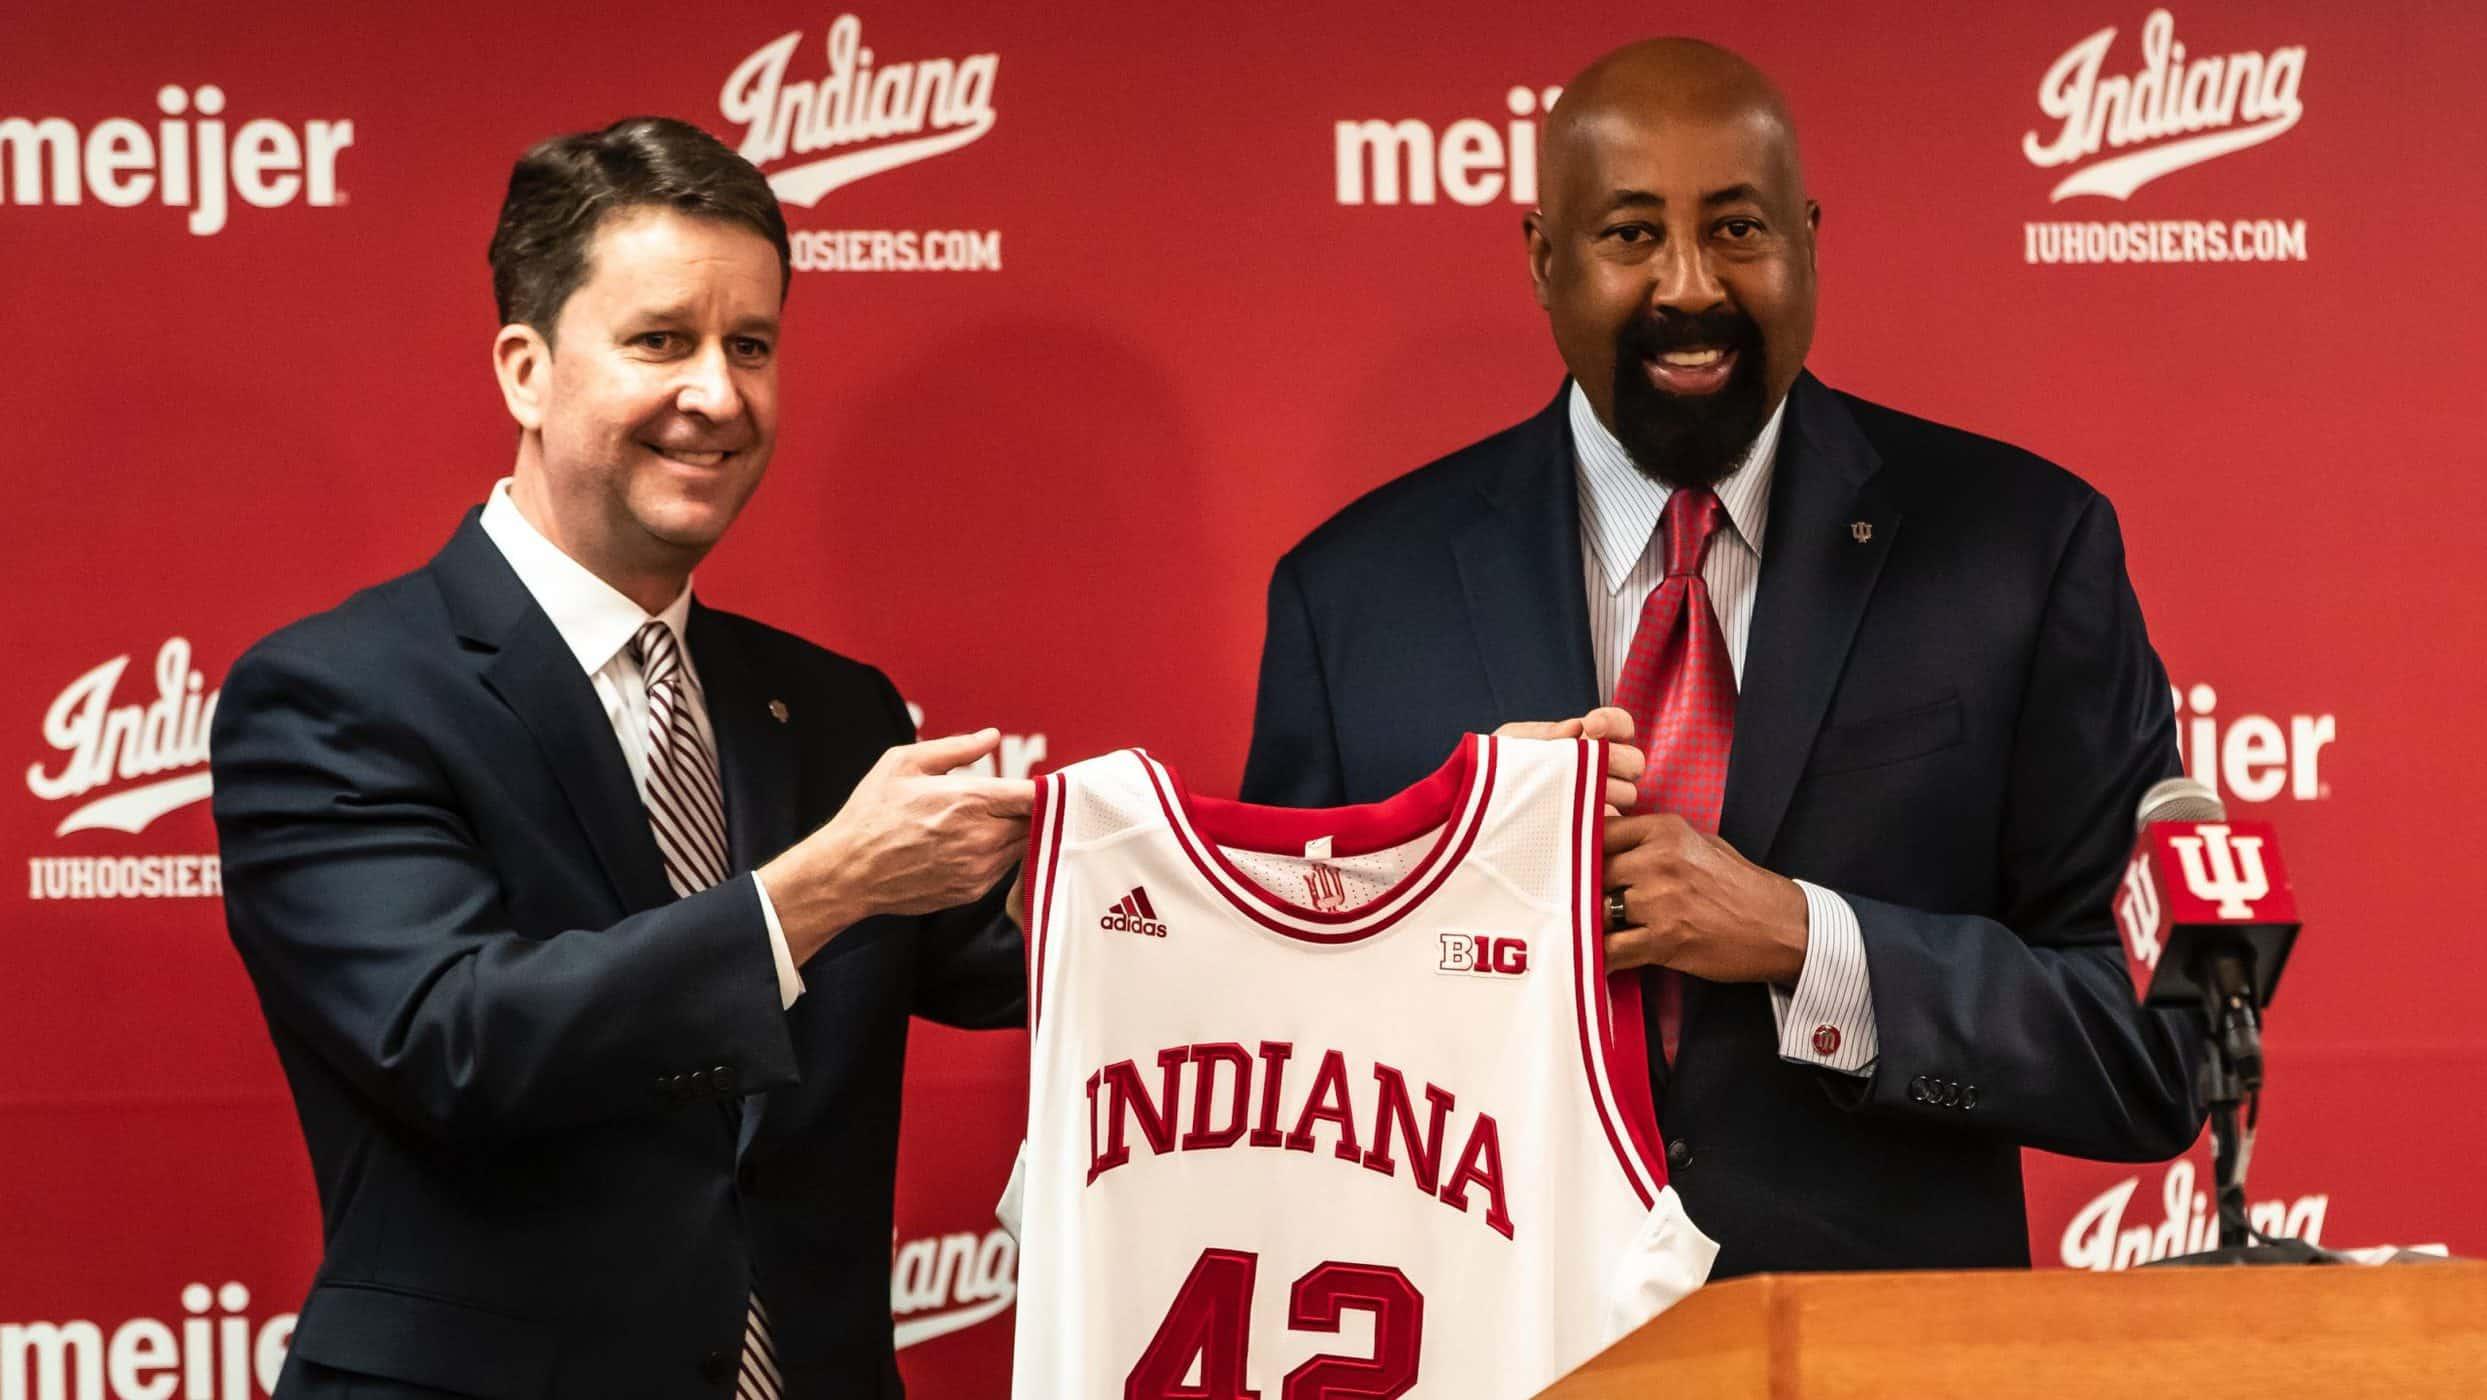 Mike Woodson, Indiana si aggrappa alla storia